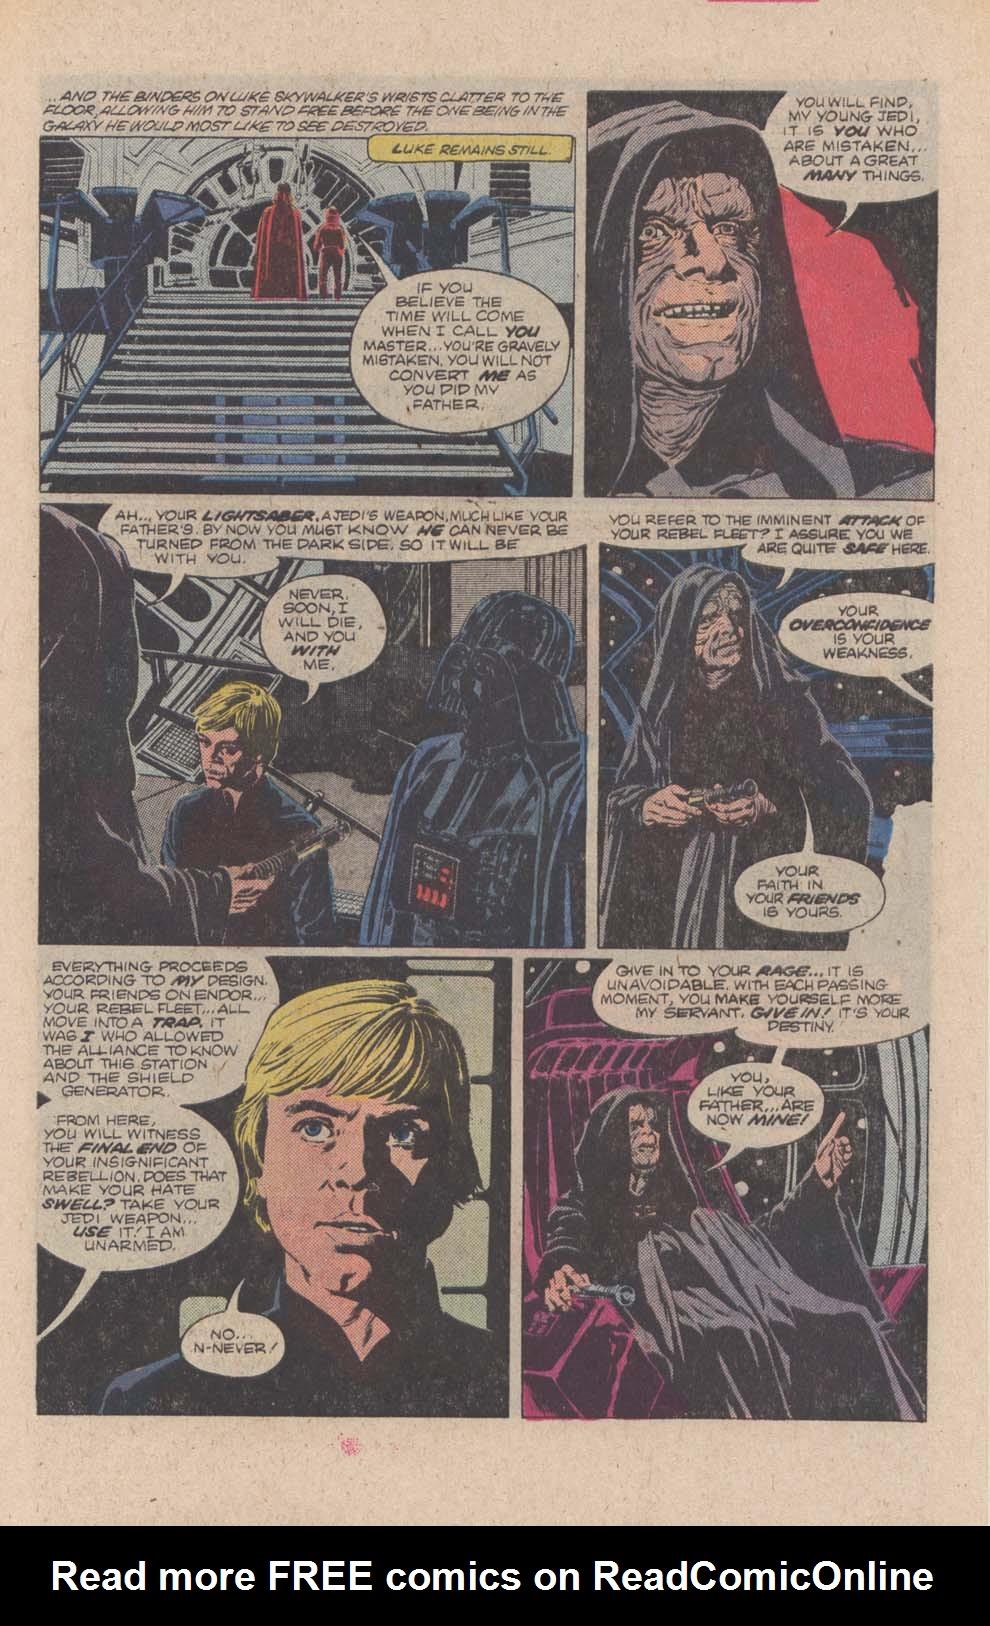 Read online Star Wars: Return of the Jedi comic -  Issue #4 - 6